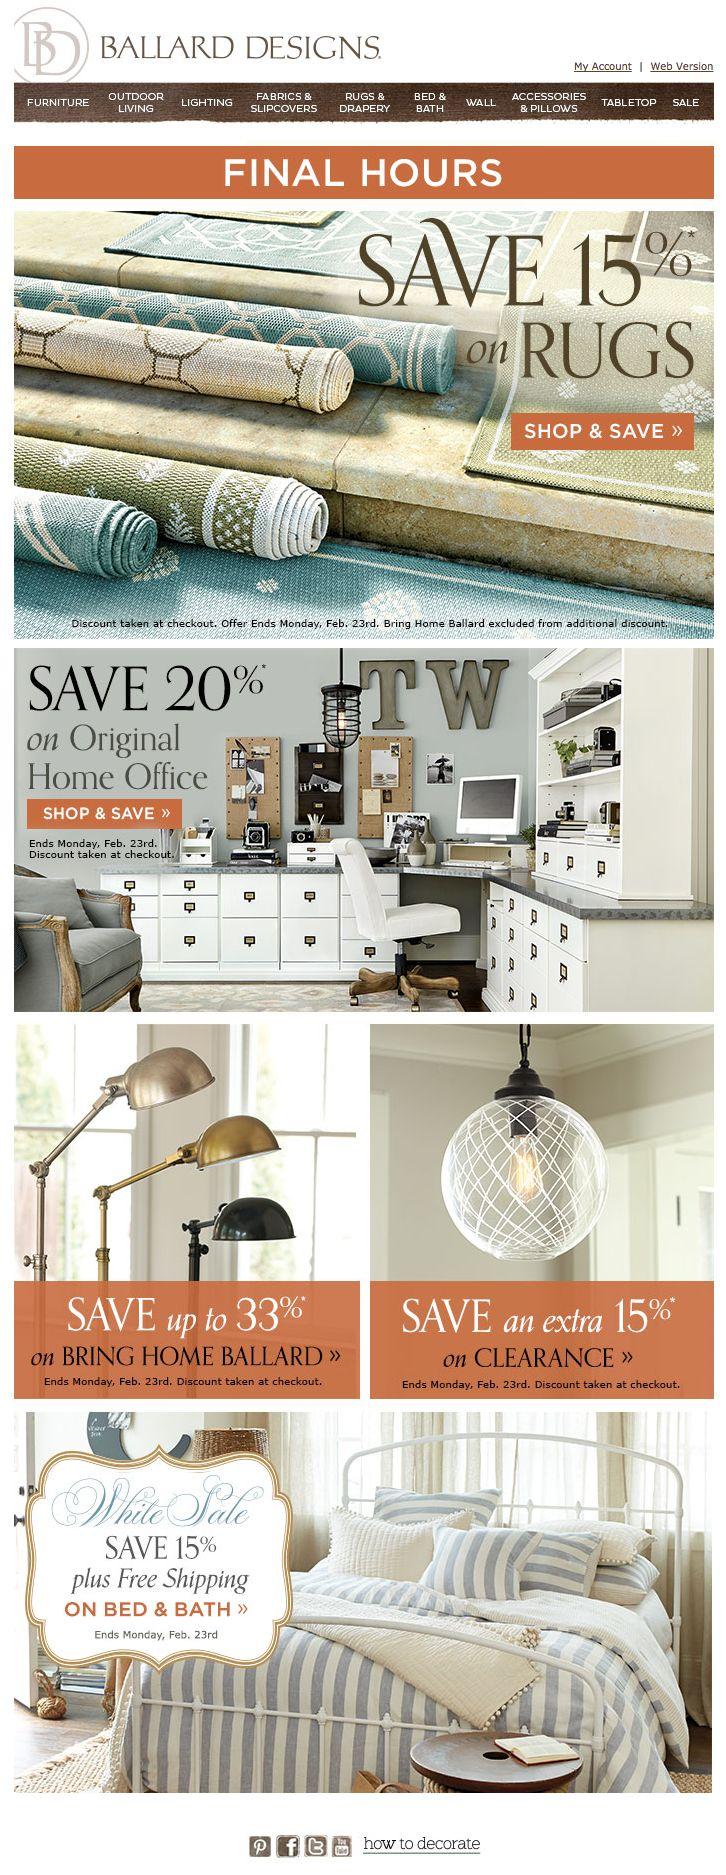 15 best email discount reminder images on pinterest email ballard designs email